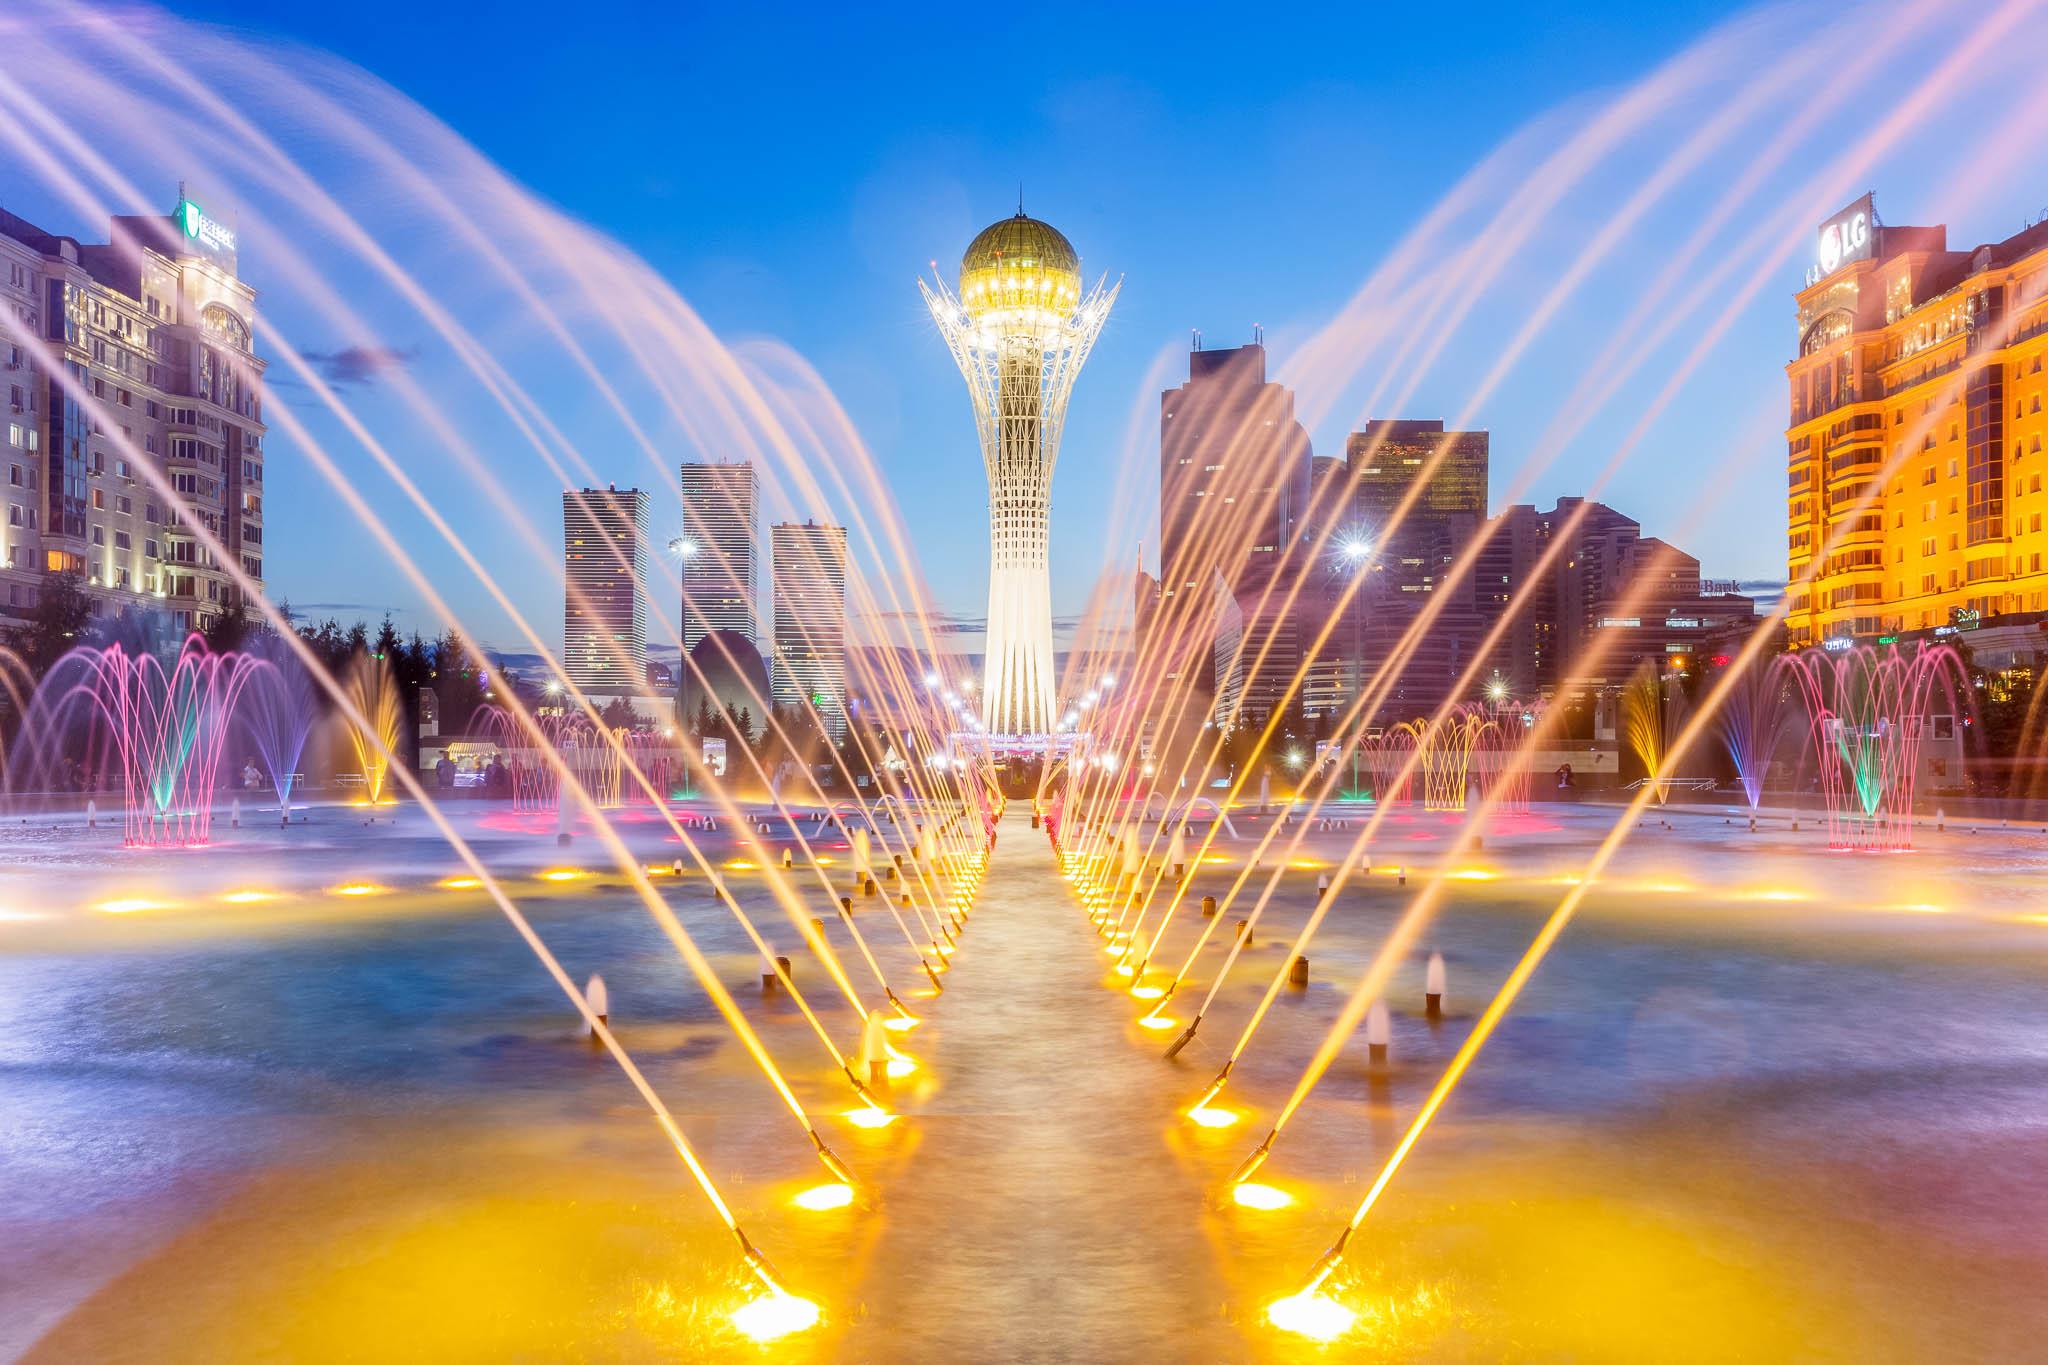 Astana Capital of Kazakhstan